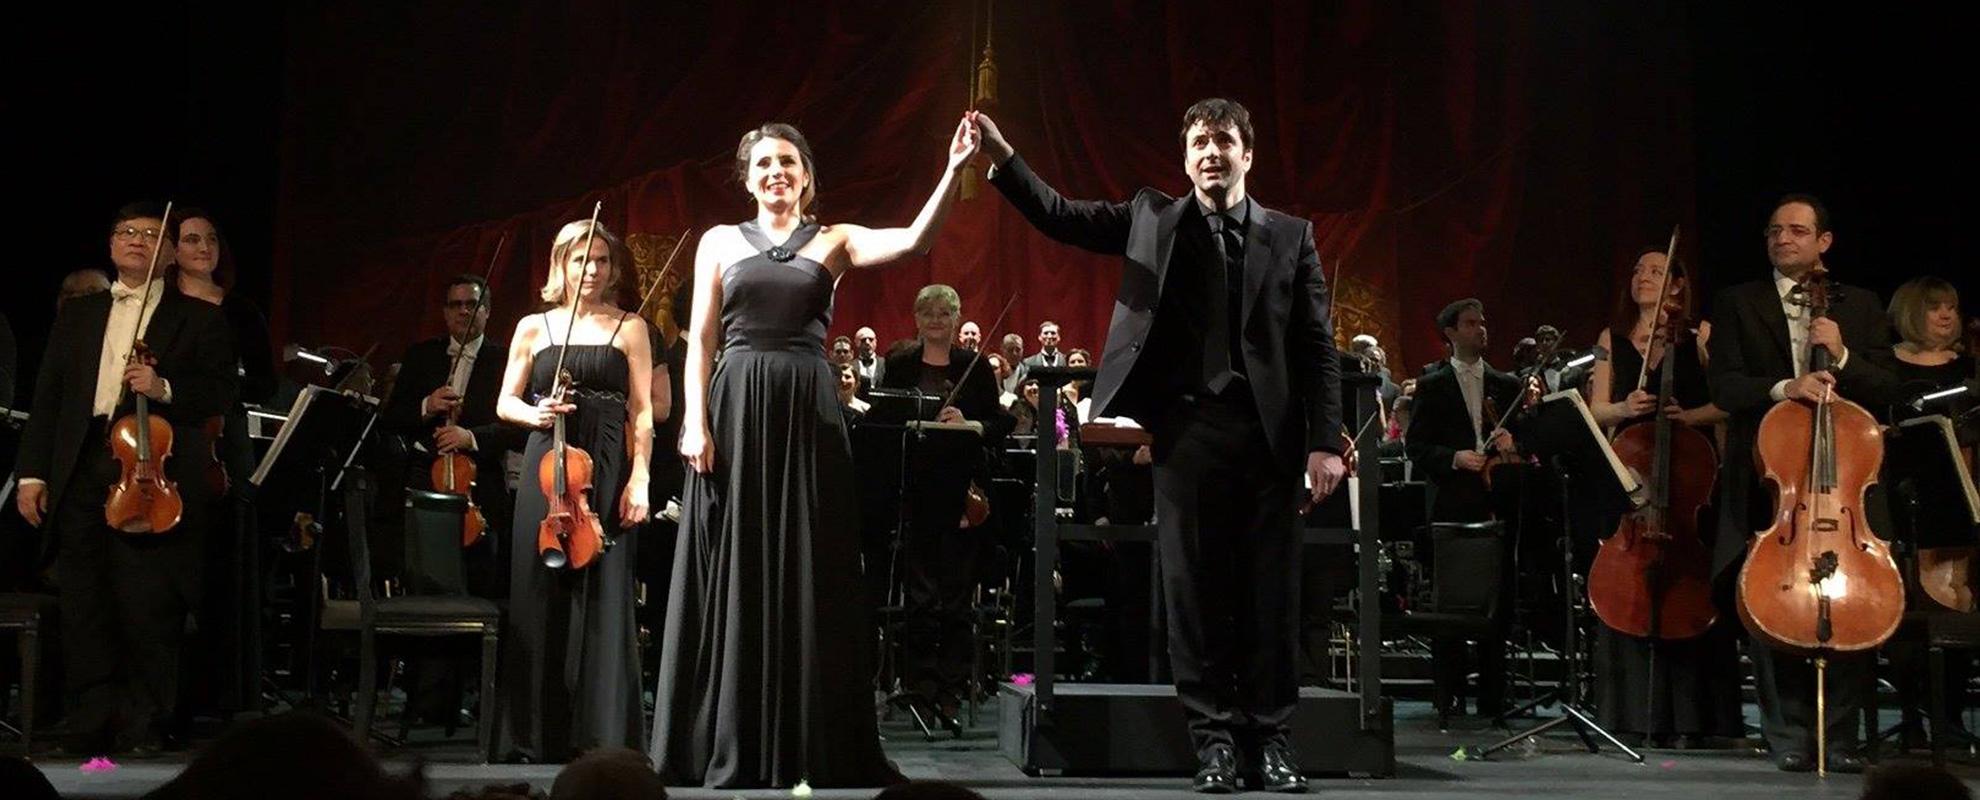 director-orquesta-oliver-diaz-brindis-sabina-puertolas